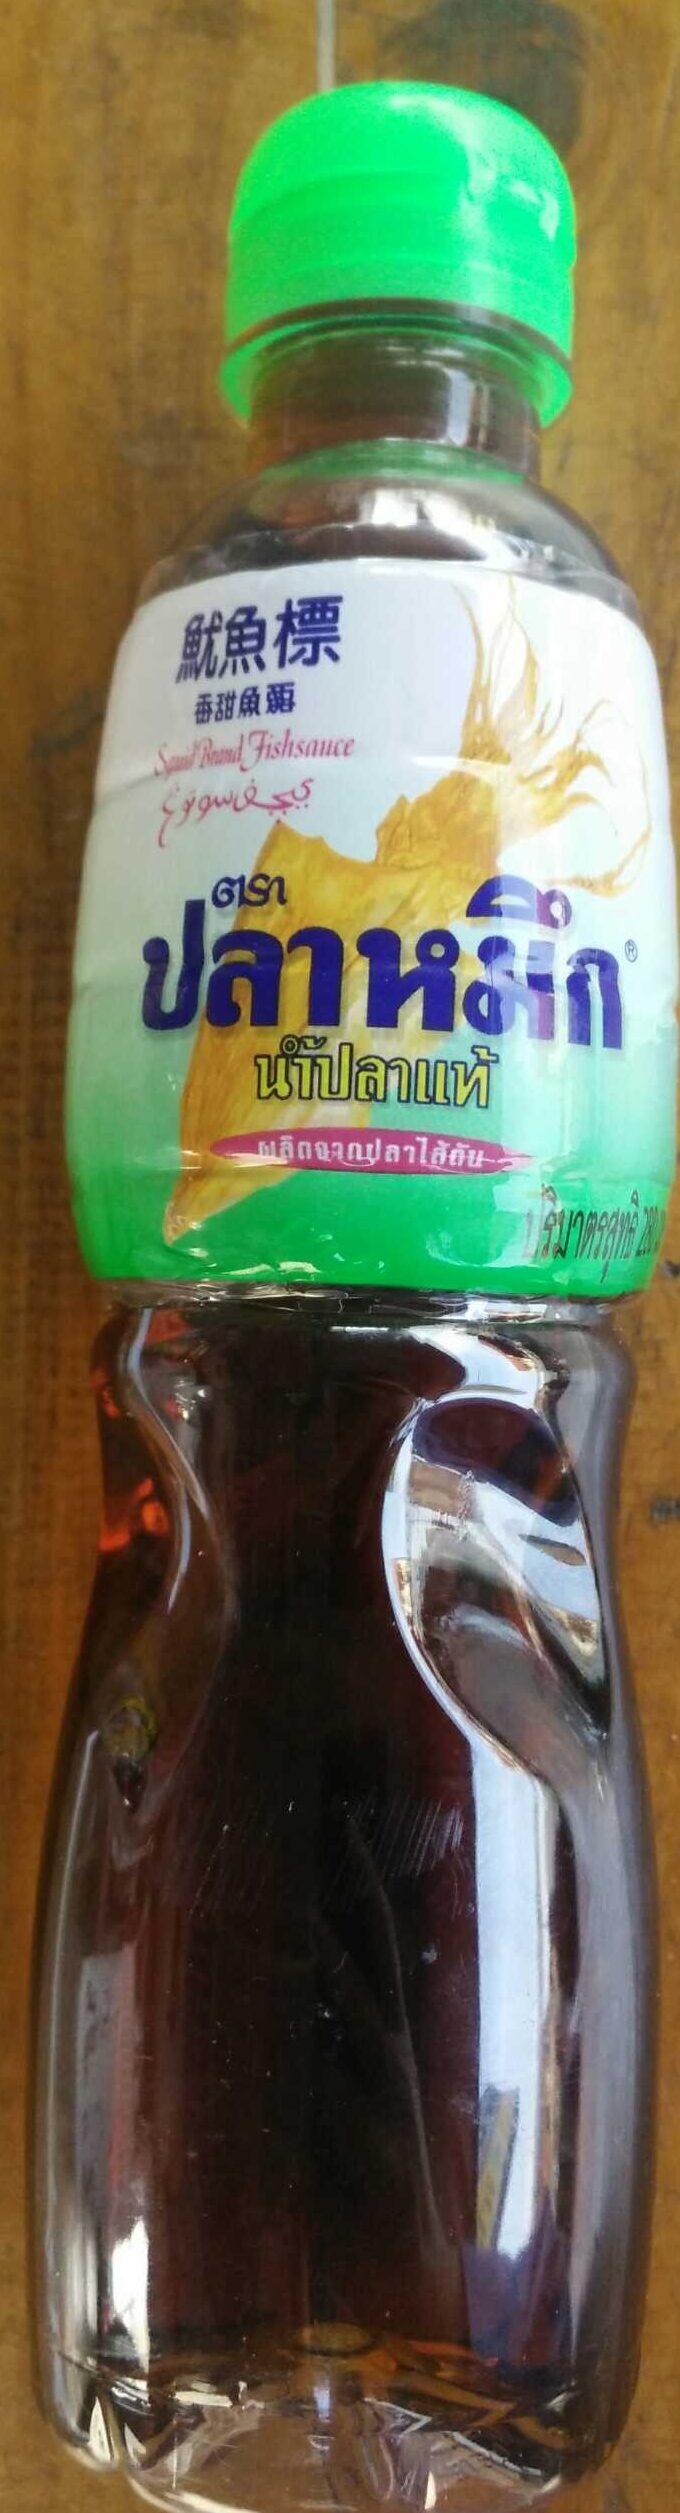 Fish sauce - Product